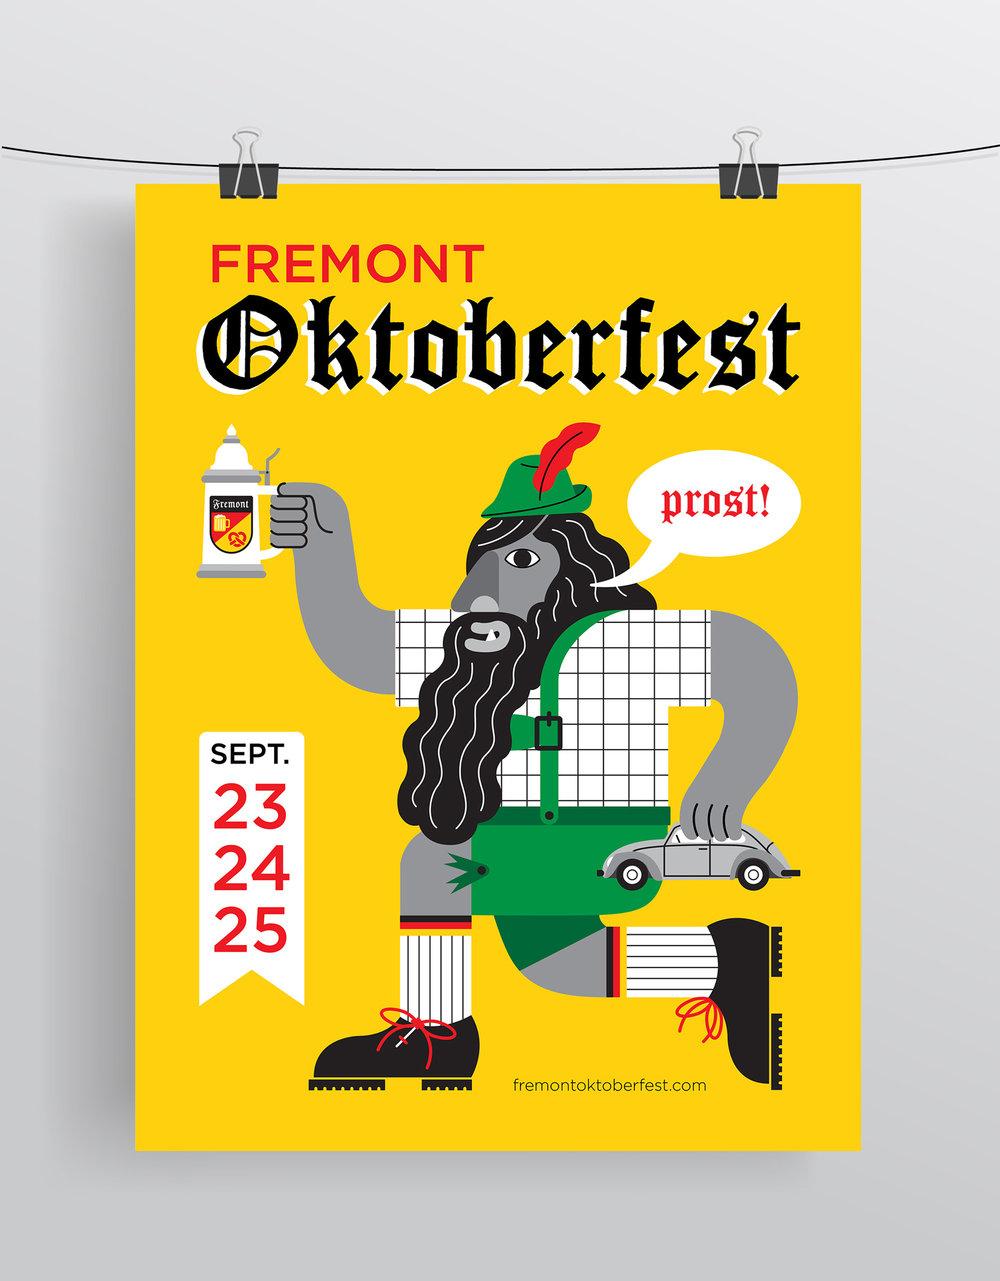 Fremont Oktoberfest  Digital Print